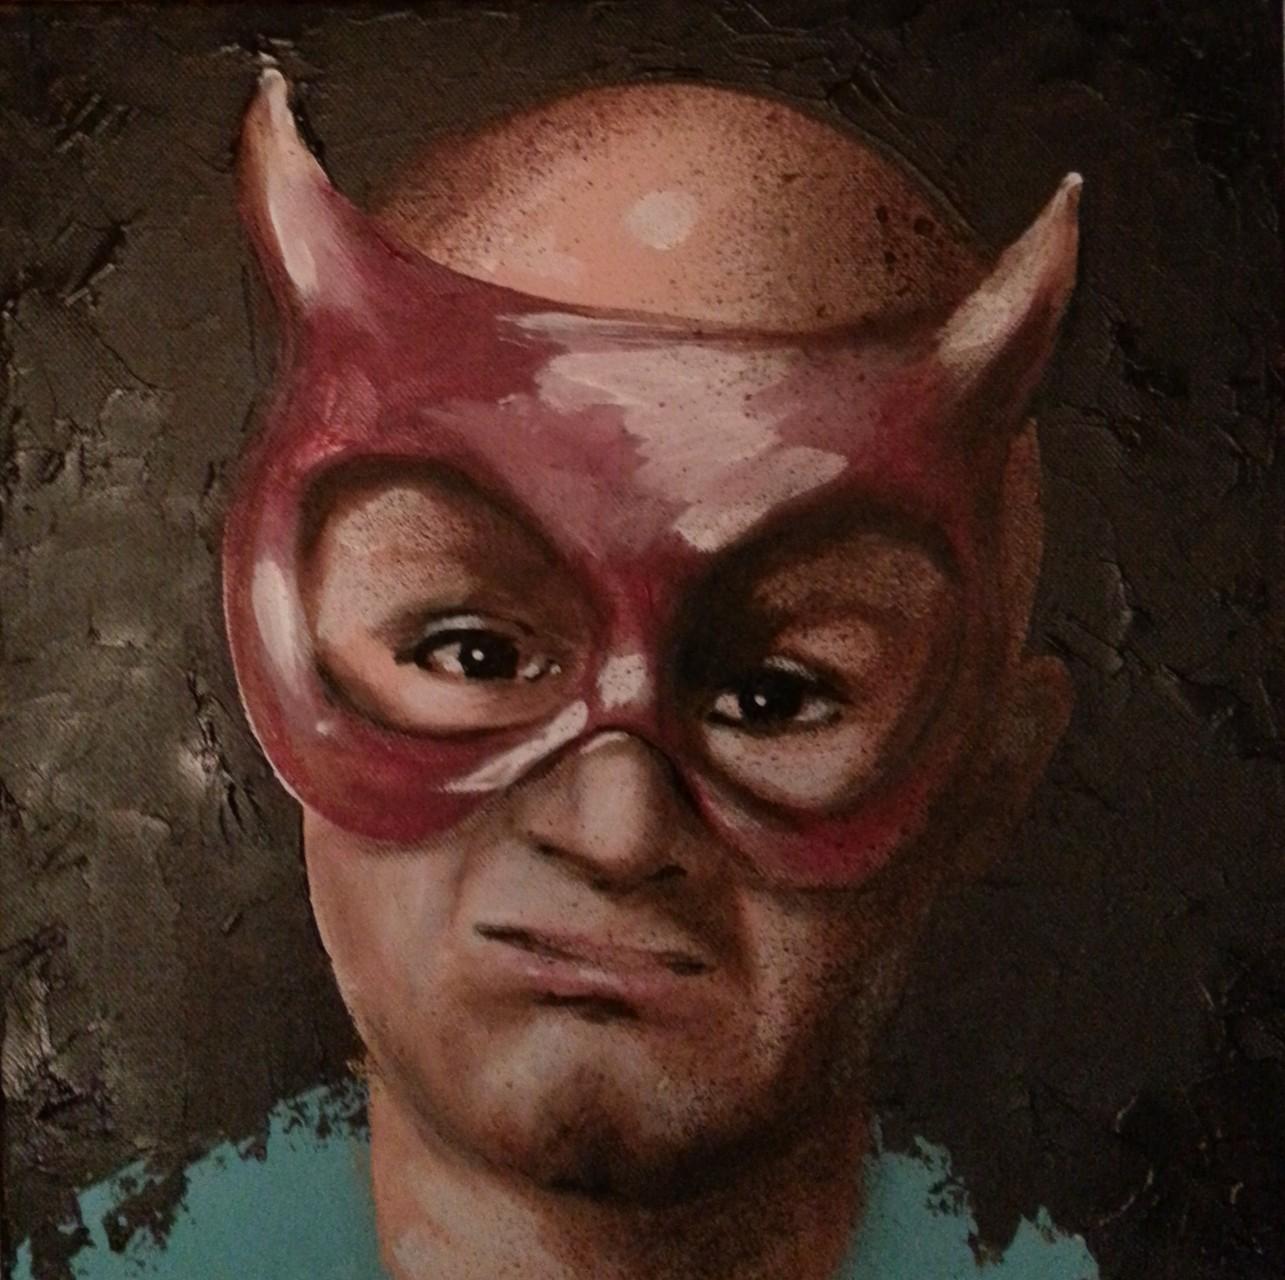 Masque rouge 30x30